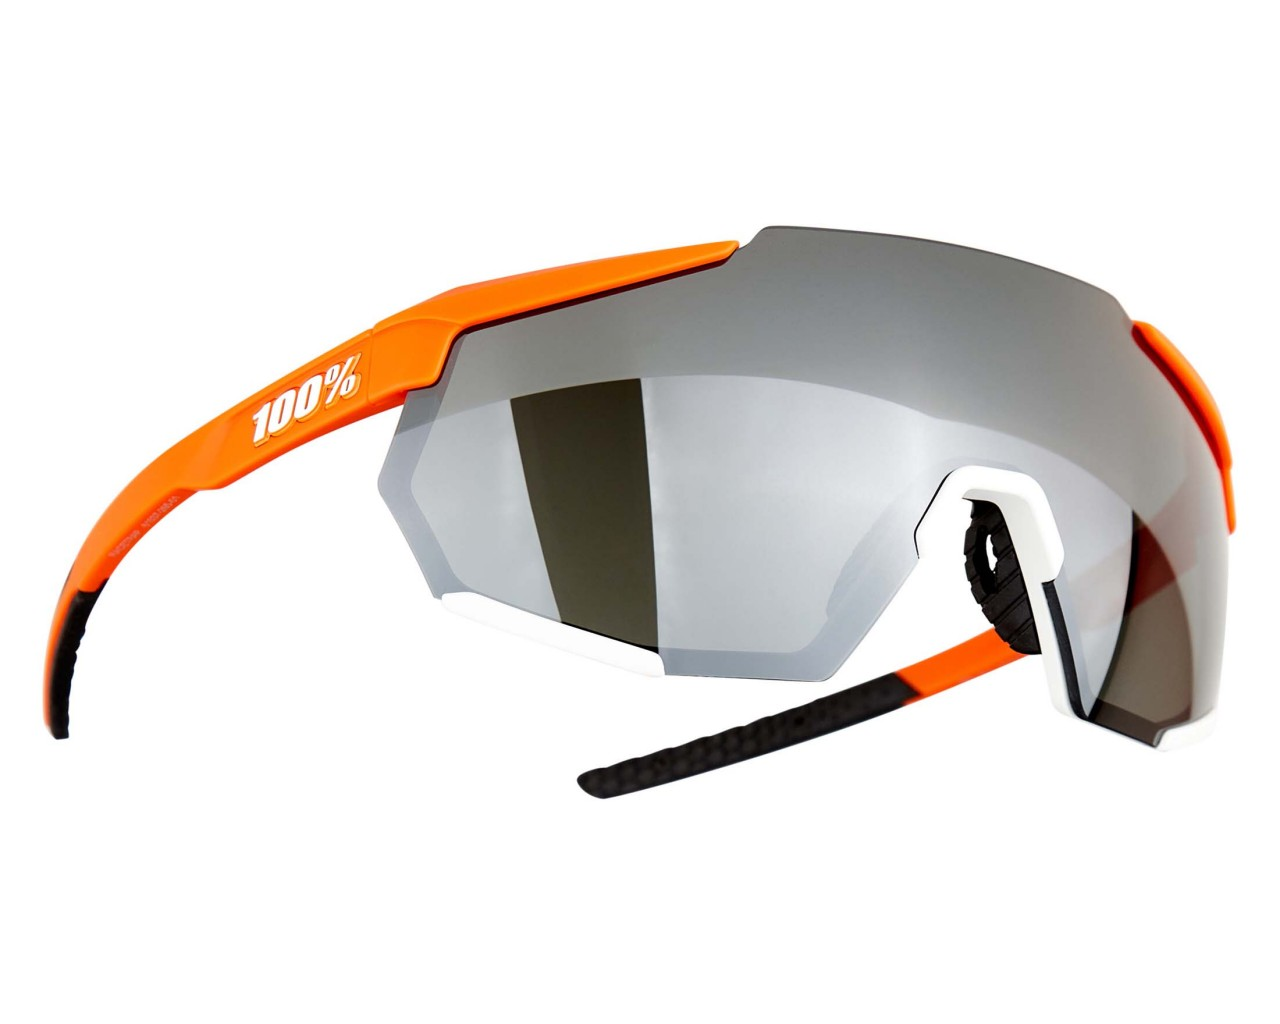 100% Racetrap Mirror Lens - Sports Sunglasses | soft tact Oxyfire